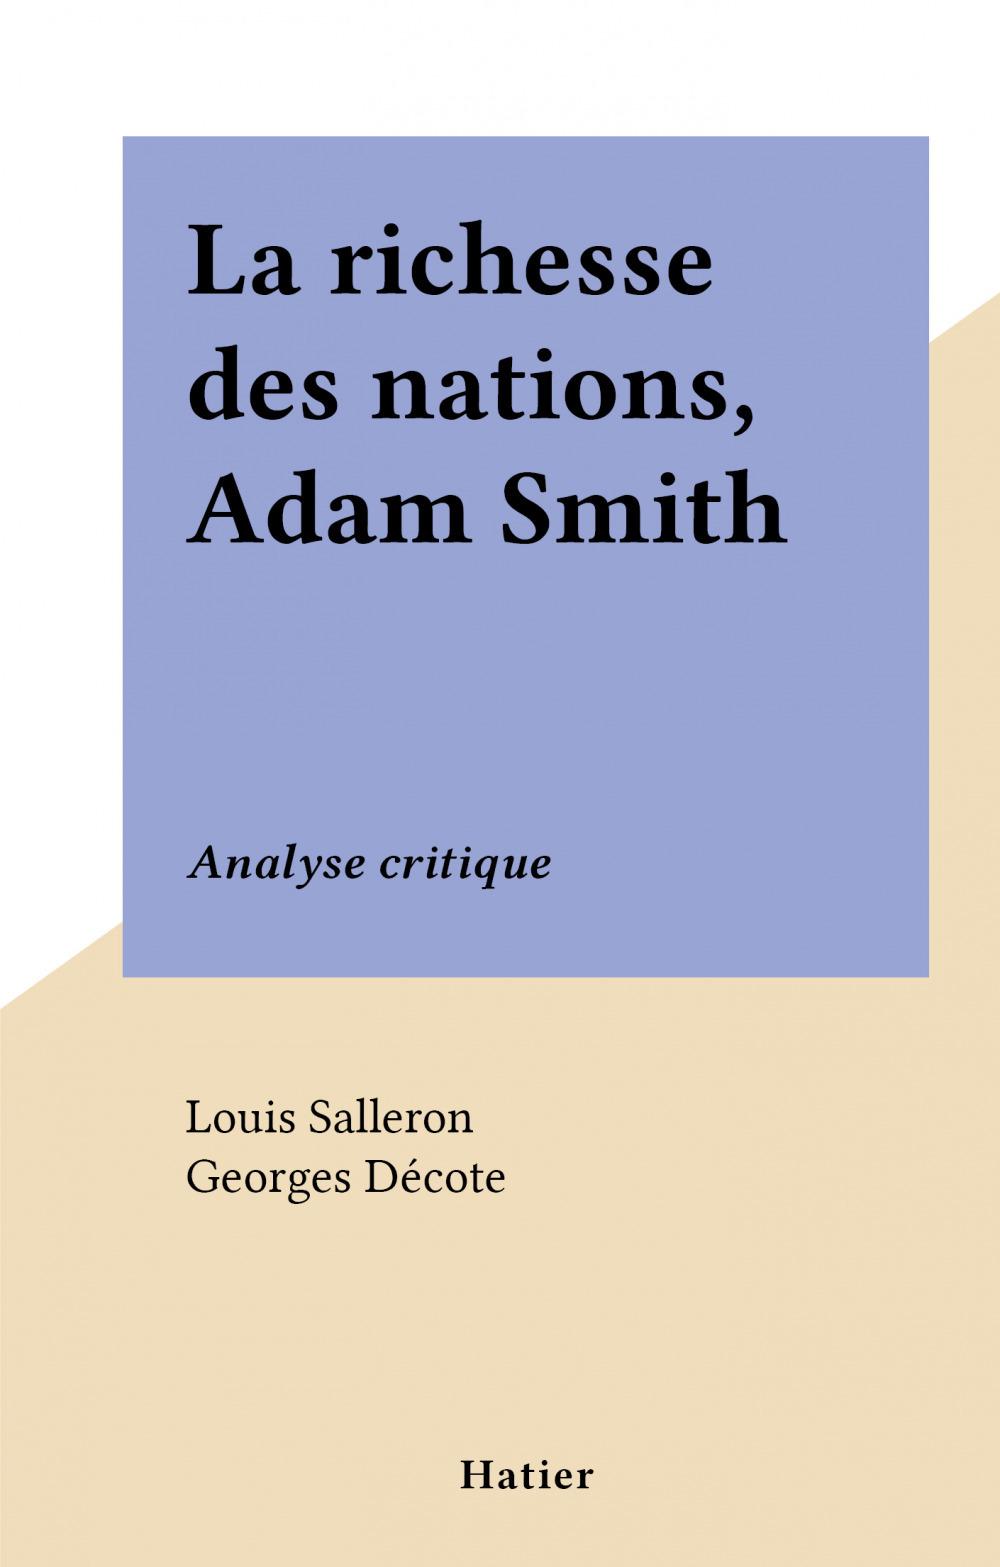 La richesse des nations, Adam Smith